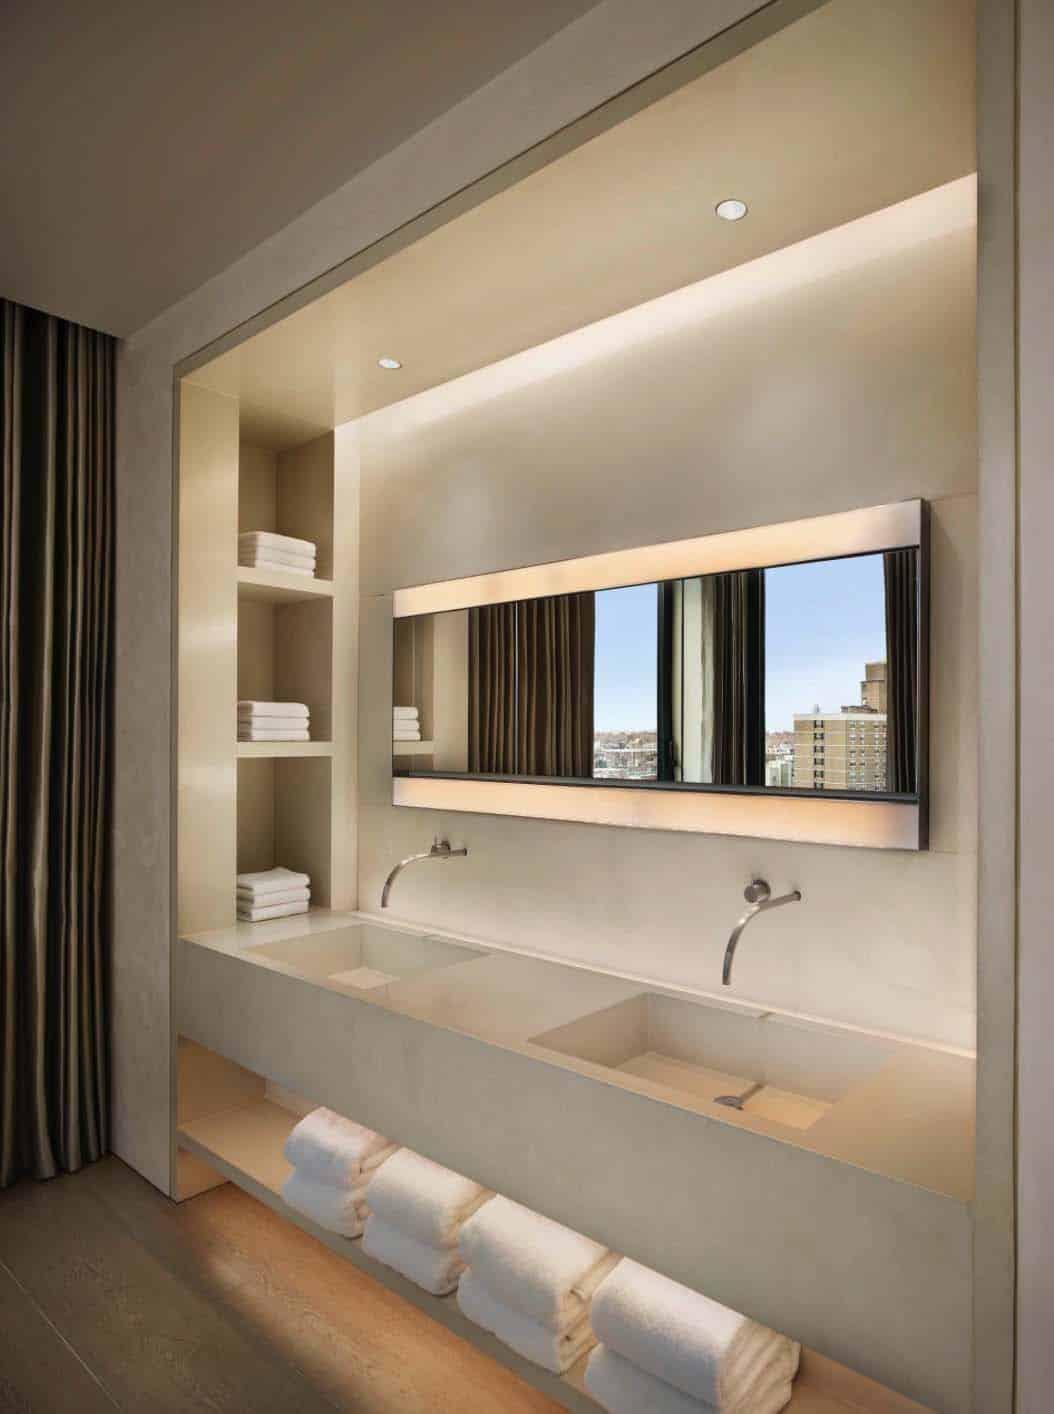 Concrete Bathroom Designs-10-1 Kindesign